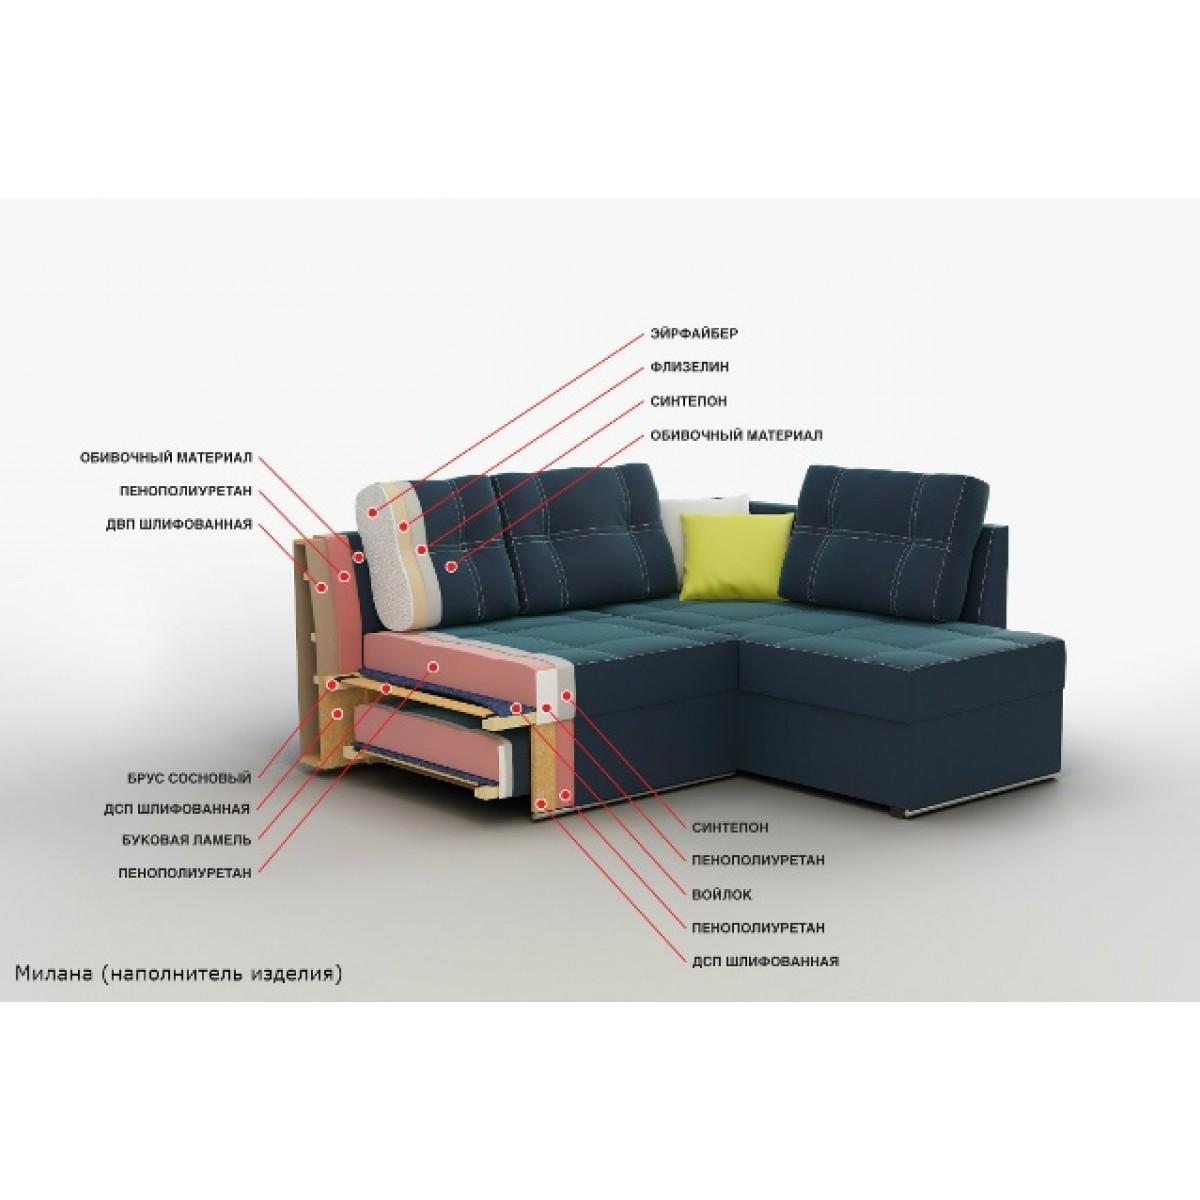 Угловой диван милана - амерс - 0 производители мебели - запо.